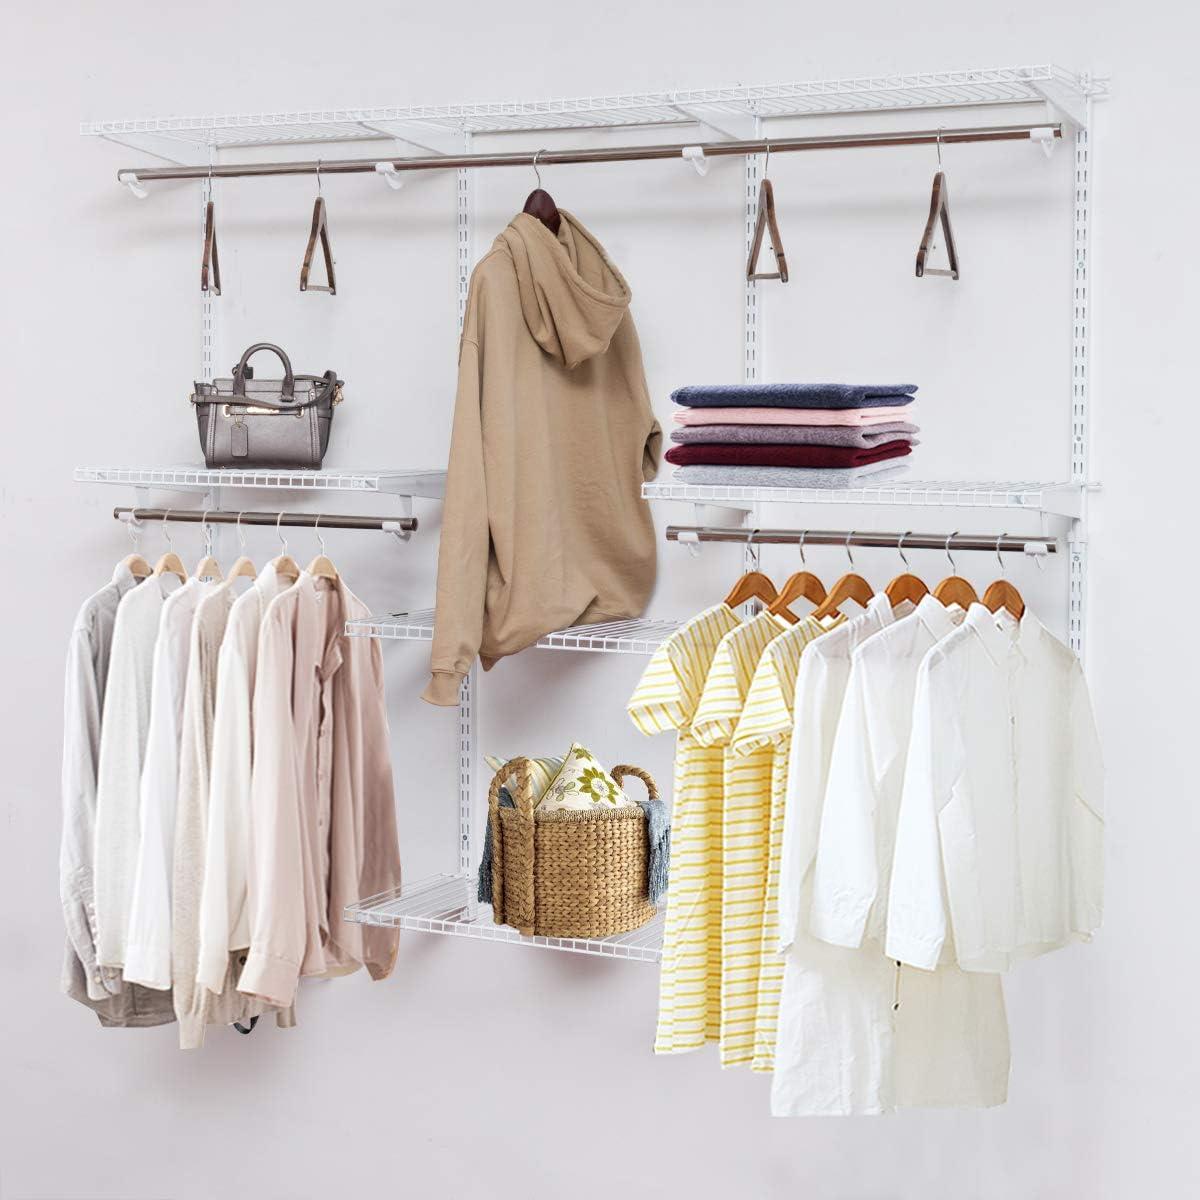 Moccha Custom Closet Organizer System, Wall Mounted Closet System with Hanging Rod, Metal Hanging Storage Organizer Rack Wardrobe with Shelves, Adjustable Closet Organizer Kit for Bedroom, White